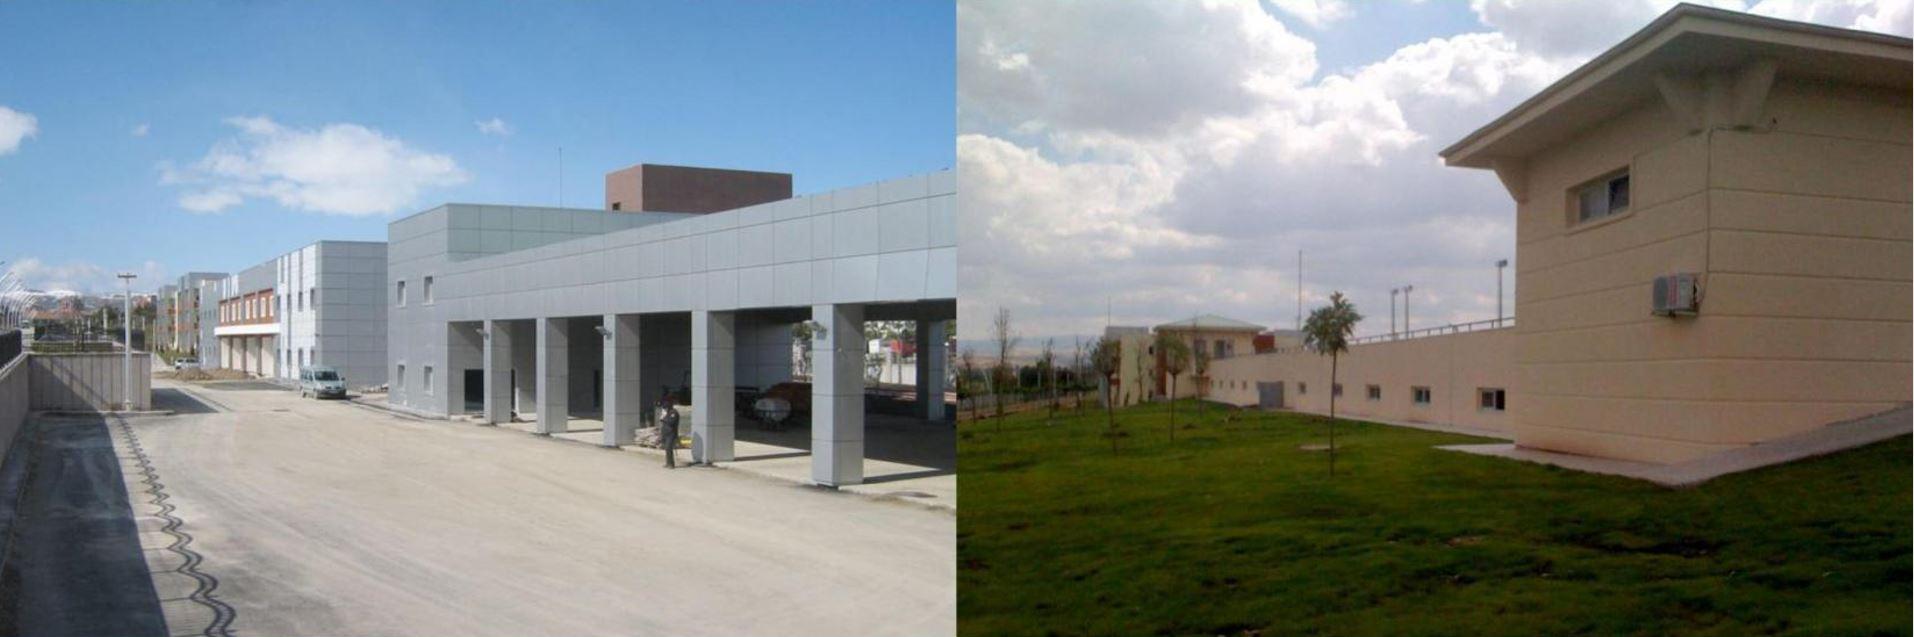 Ankara Saray Stadyum Kompleksi Servis Binaları İnşaatı